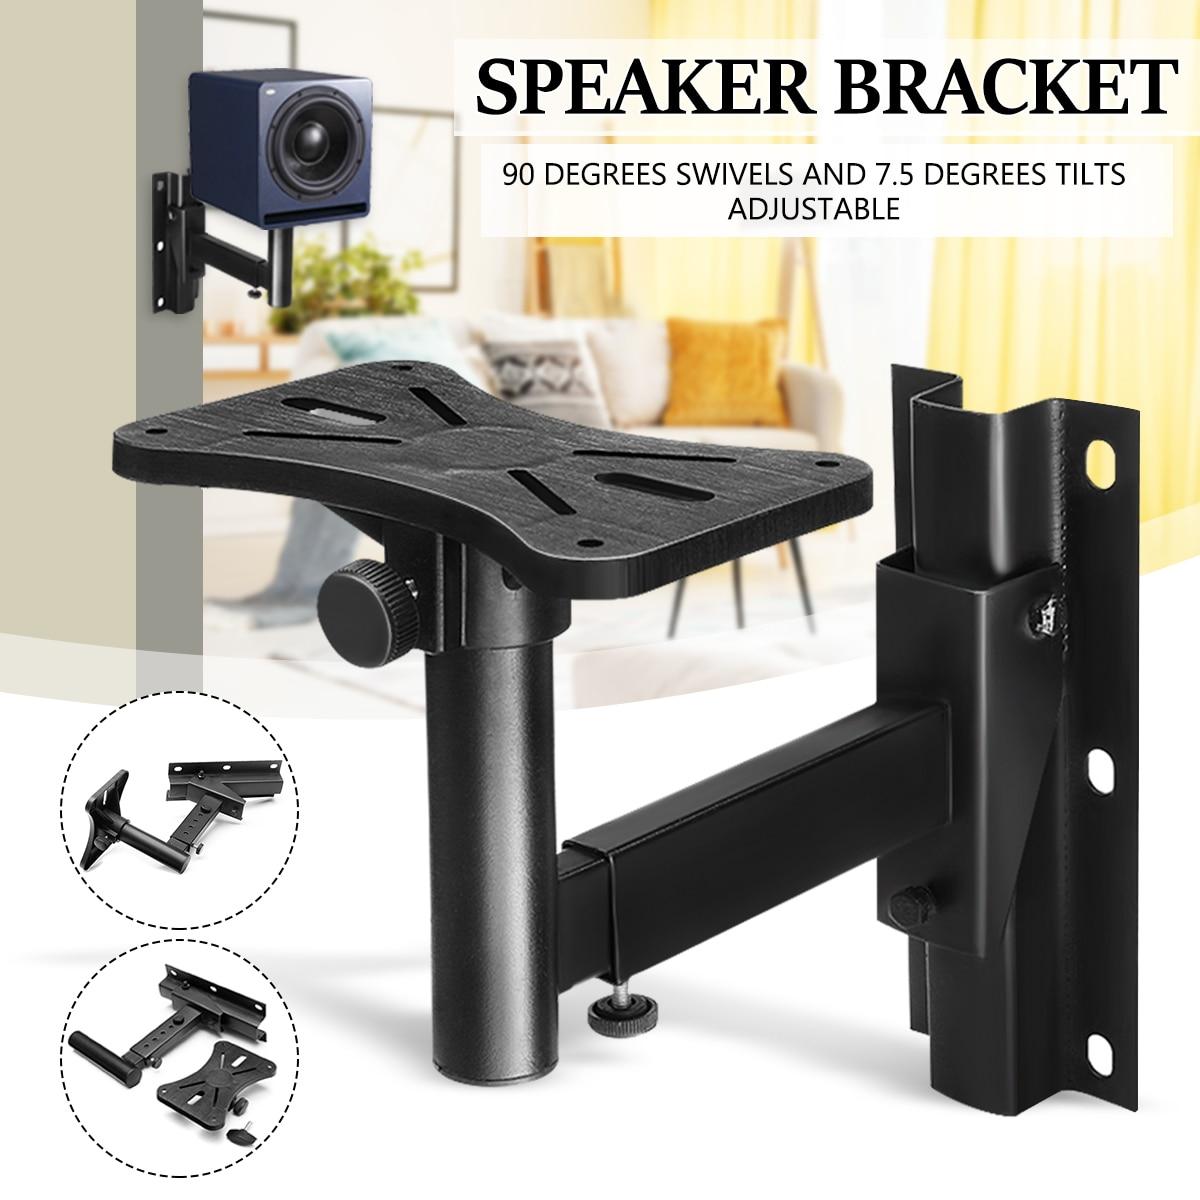 KINCO 1 PC Universal Tilting 90 Degree Rotating Surround Sound Speaker Bracket Wall Mount Holder Stand For 35 Kg Maximum